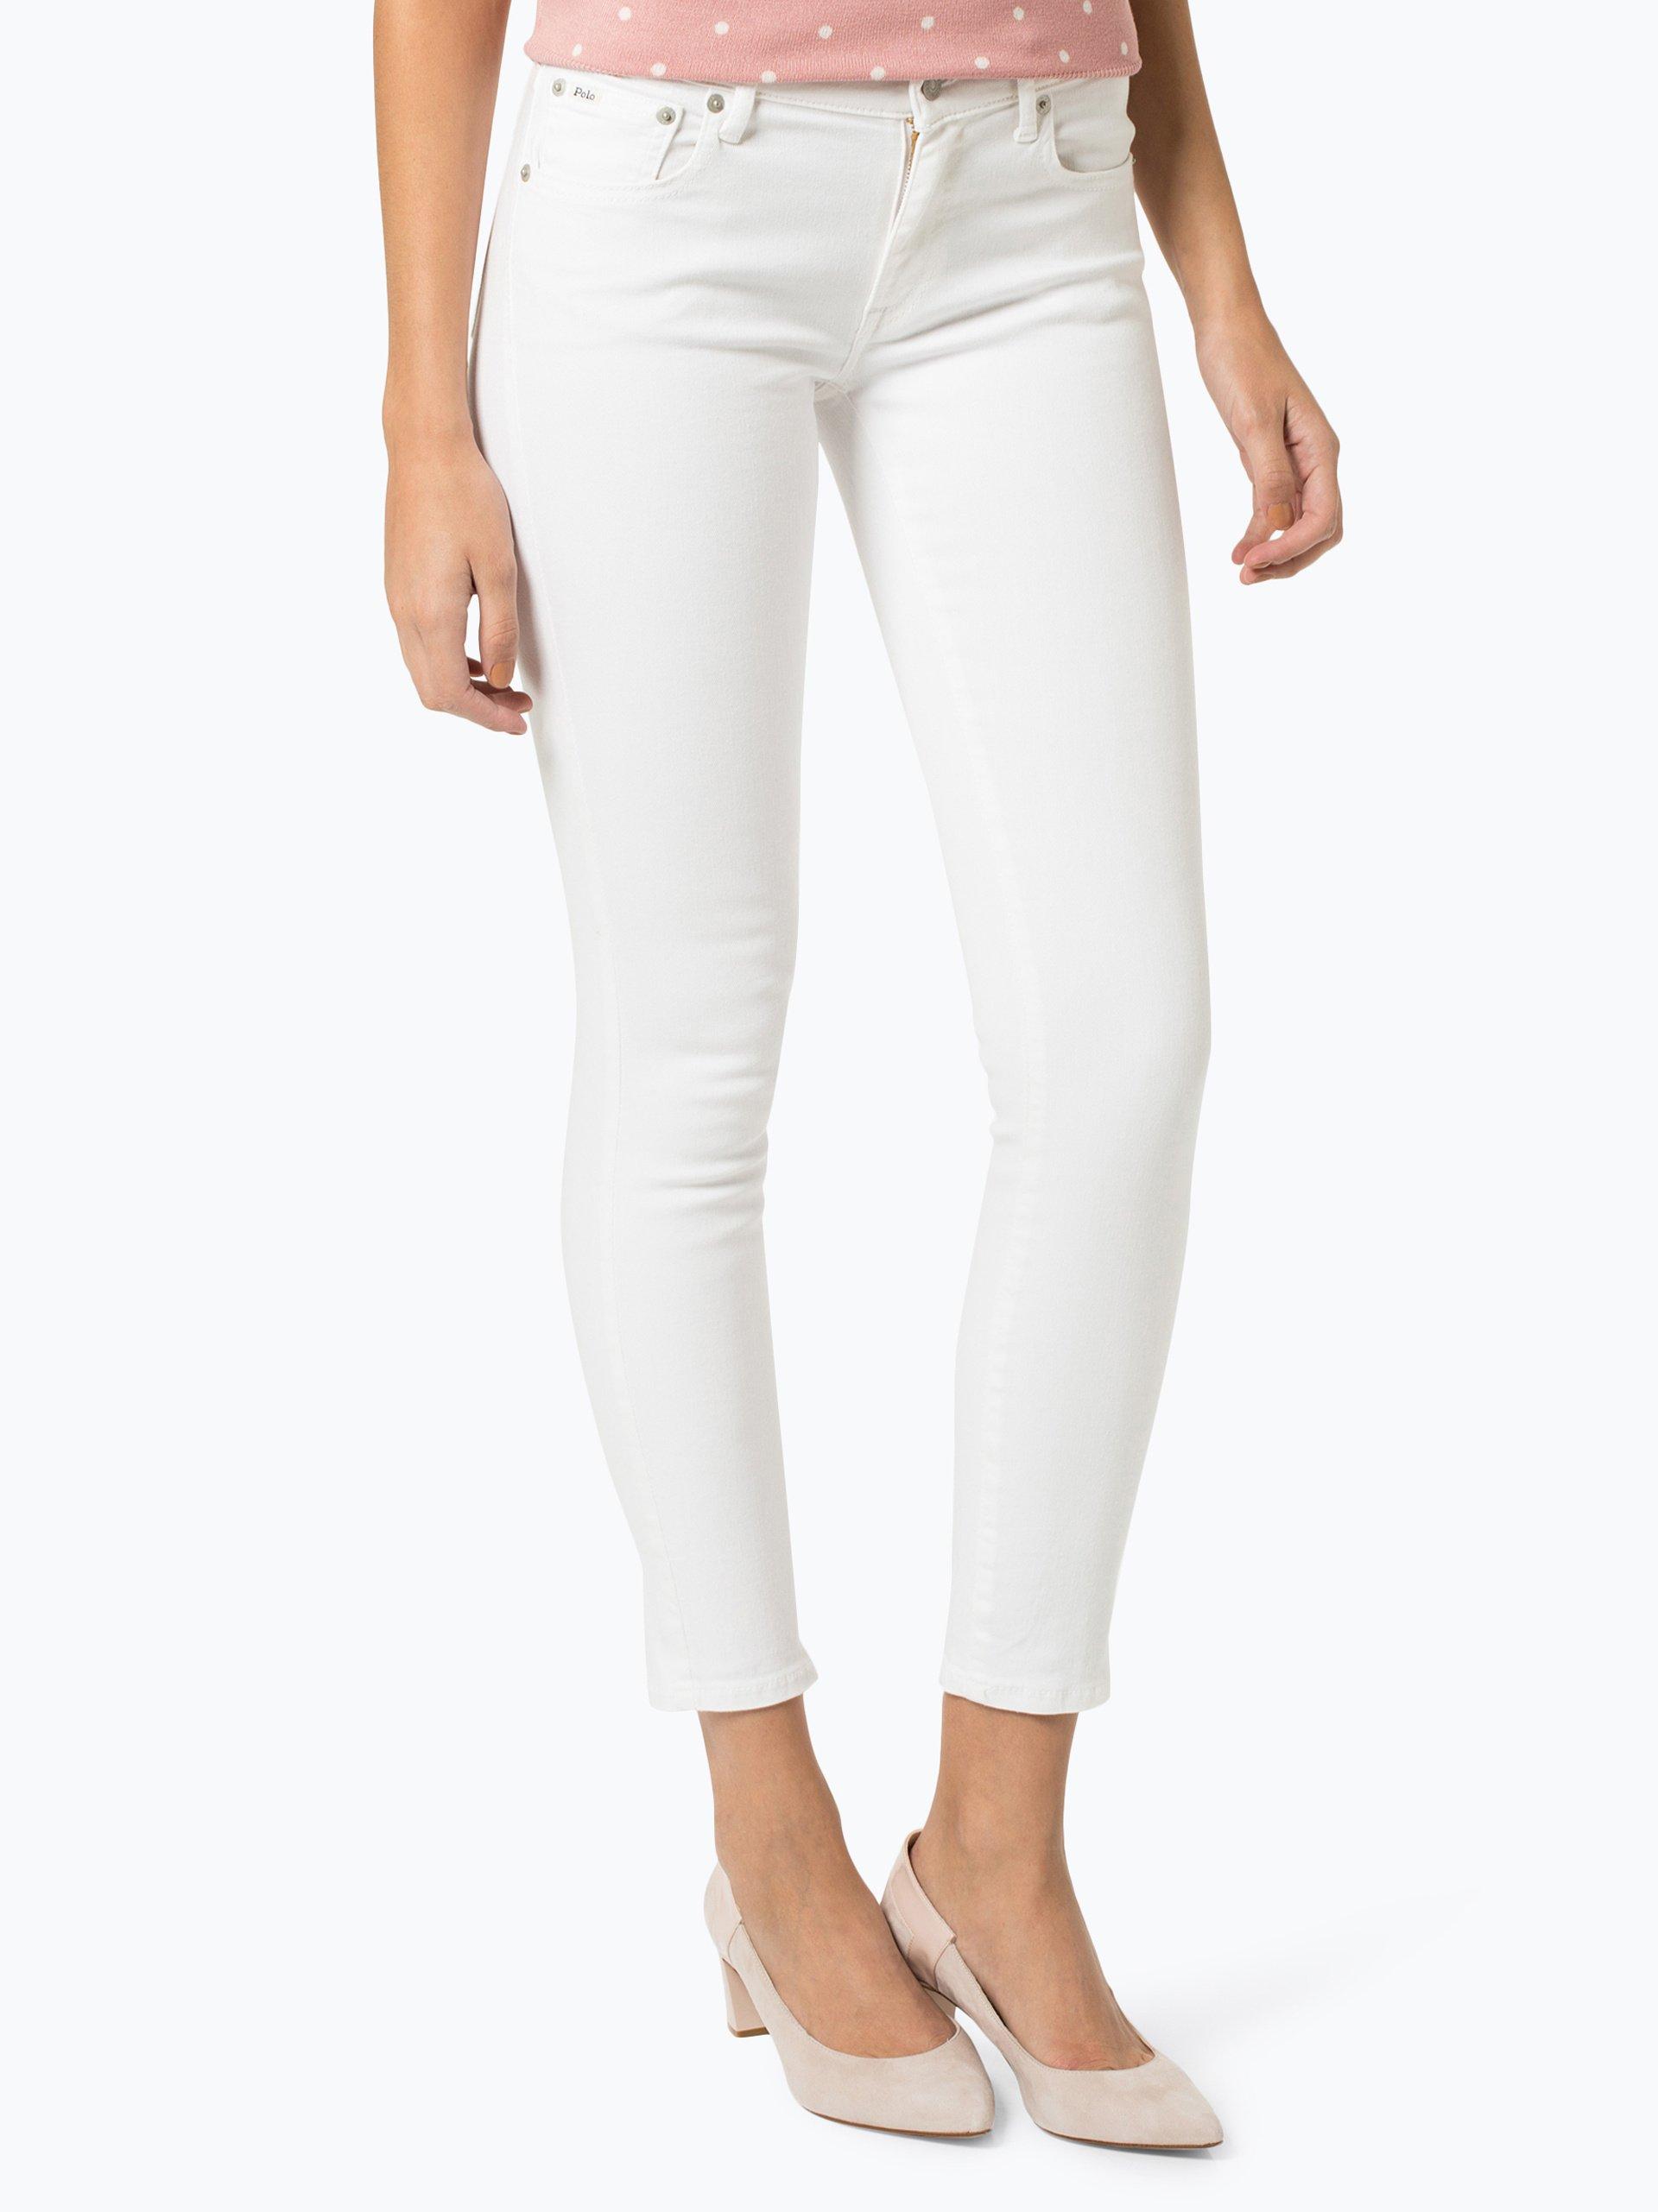 Polo Ralph Lauren Damen Jeans - Tompkins Skinny